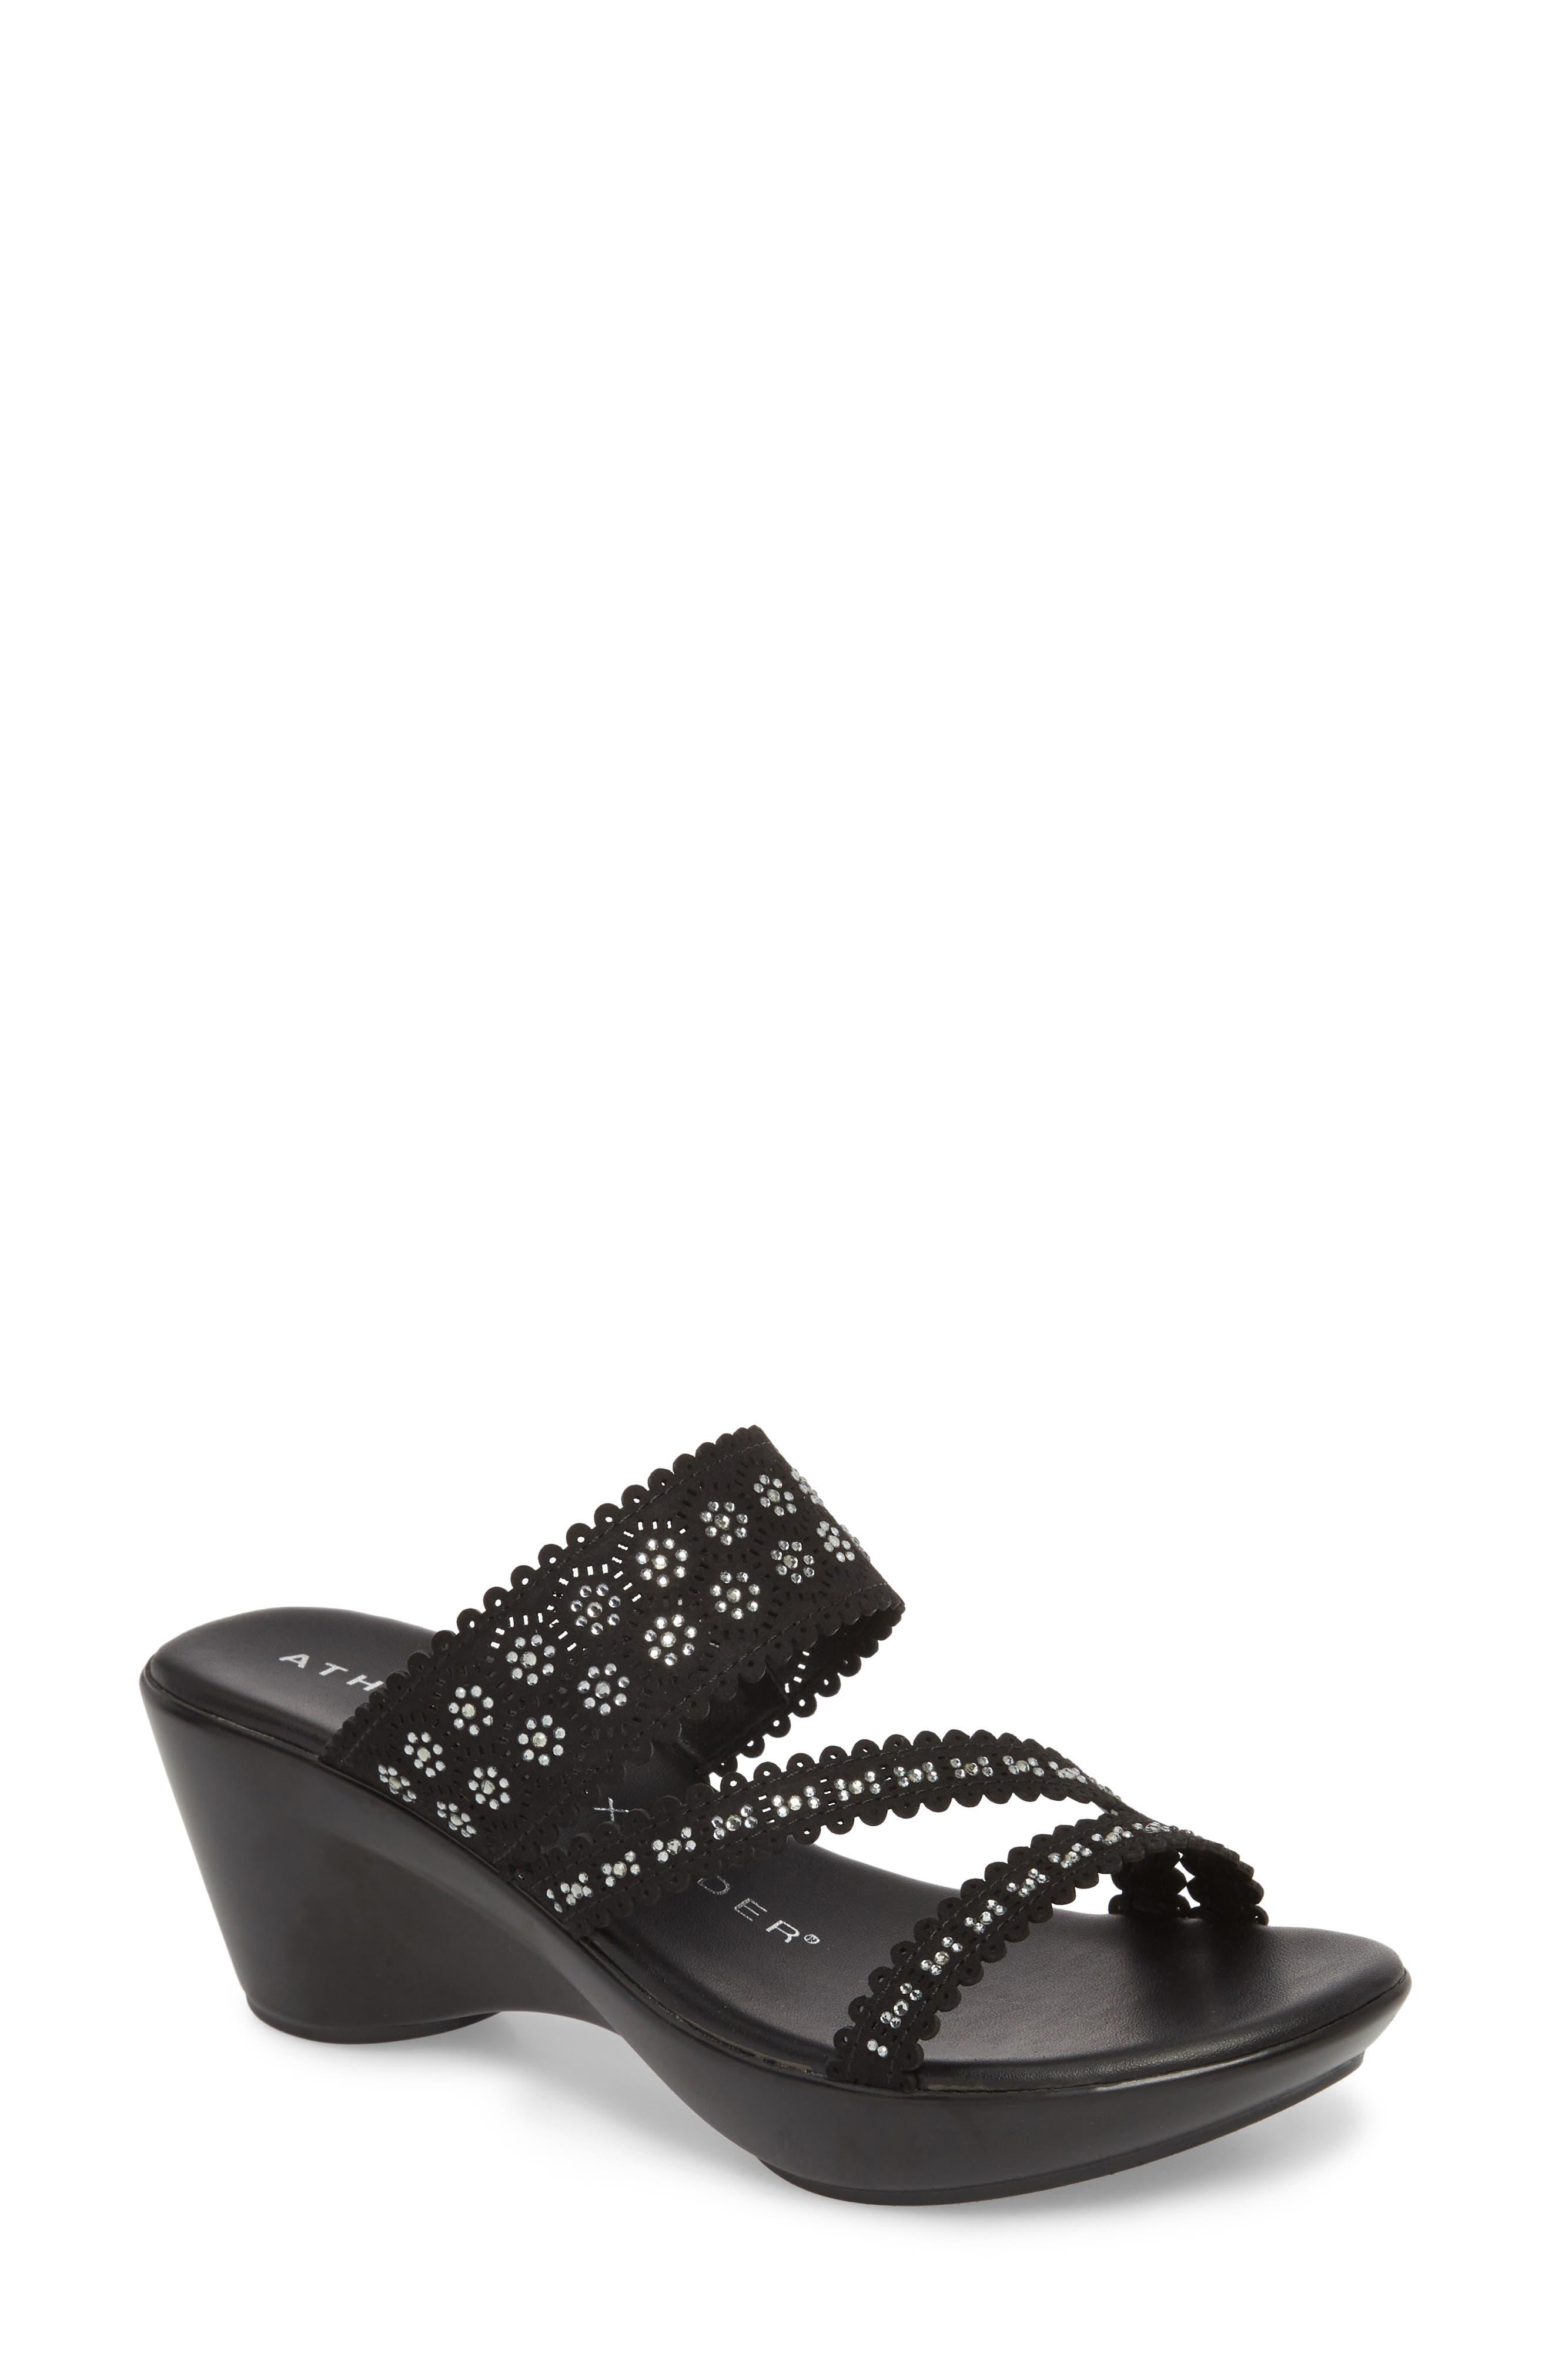 Poppy Wedge Sandal,                             Main thumbnail 1, color,                             Black Fabric